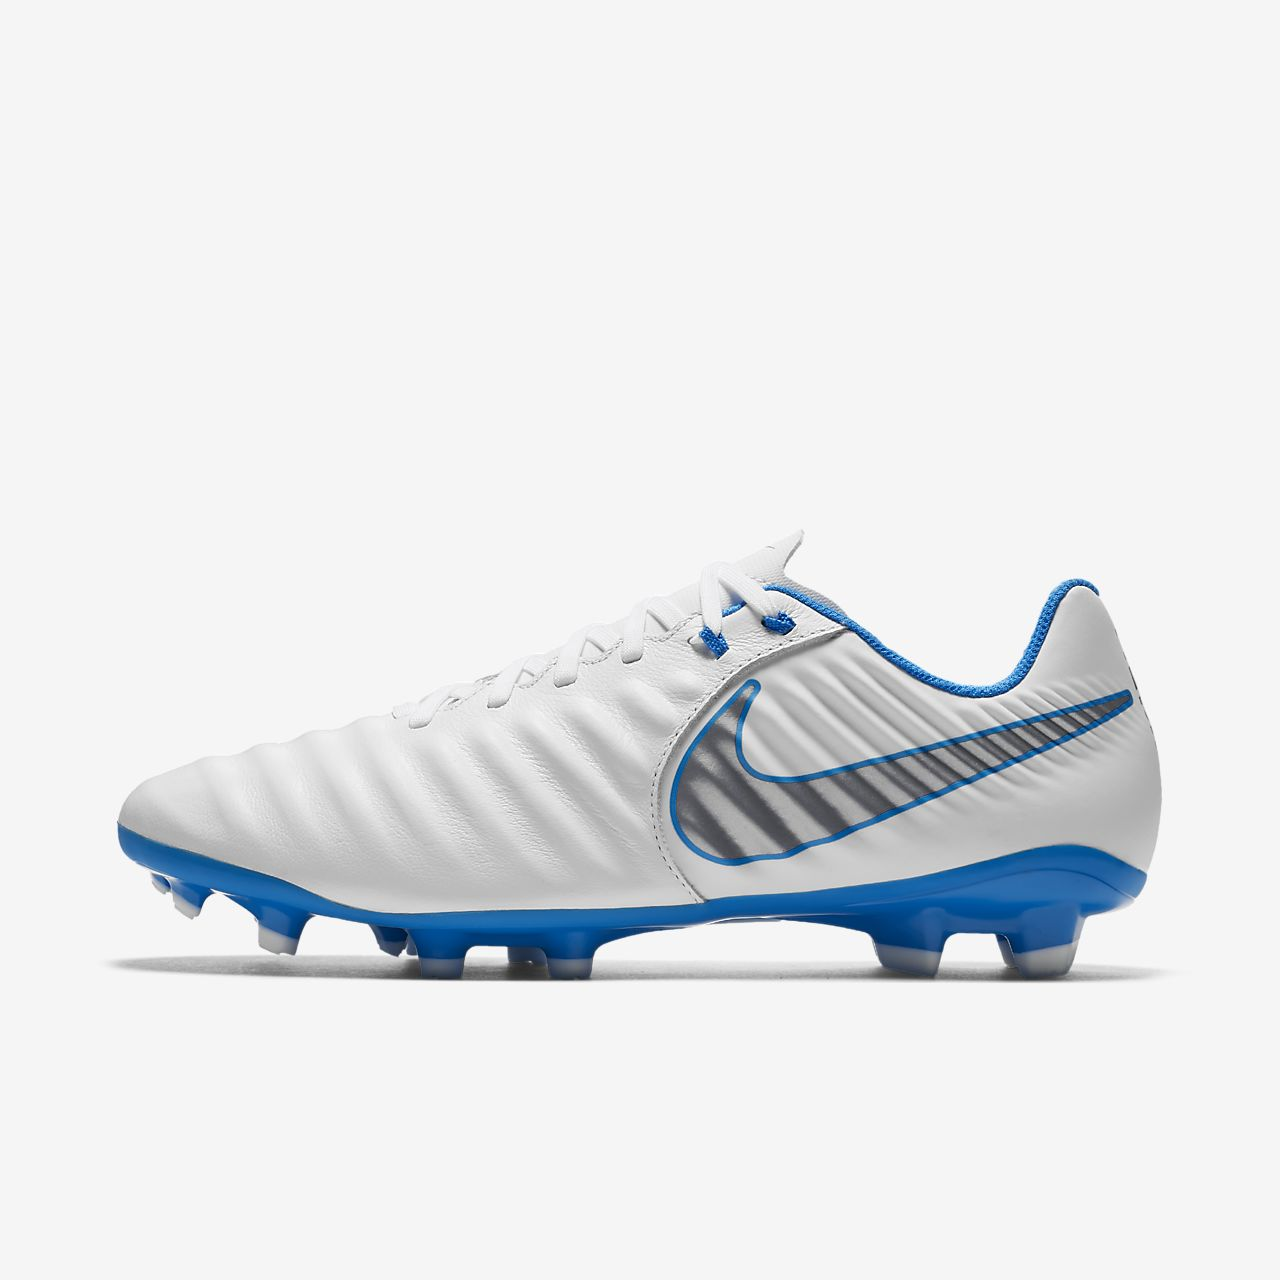 34b21204c3c1 ... best price nike tiempo legend vii firm ground football boot 08e55 e4d2b